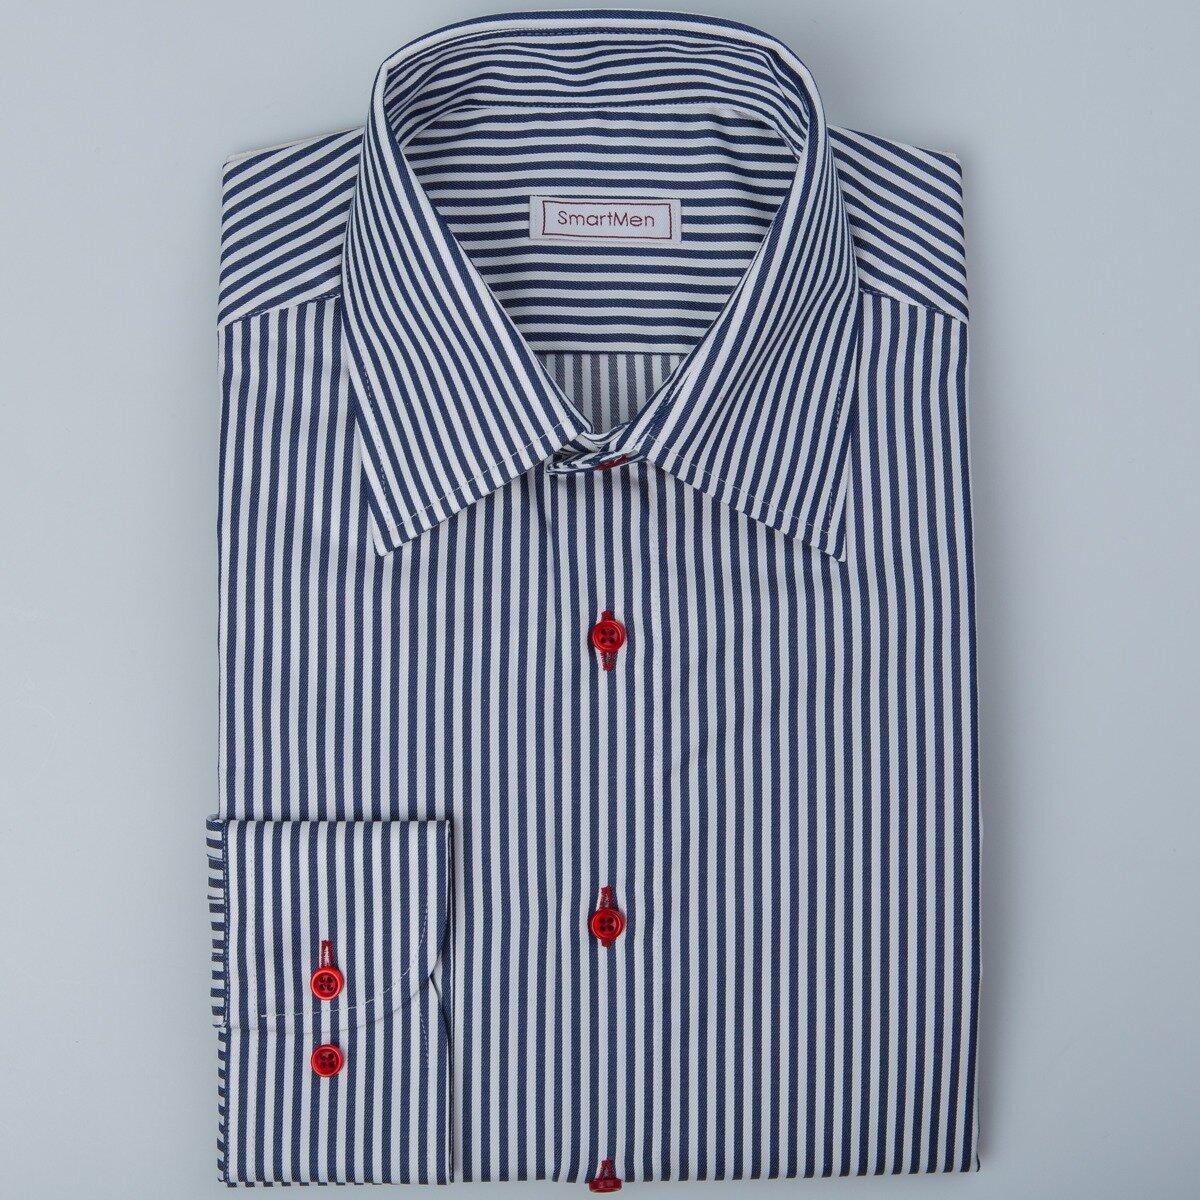 adc2f8829d73 Pánska košeľa modrý prúžok Non Iron SmartMen